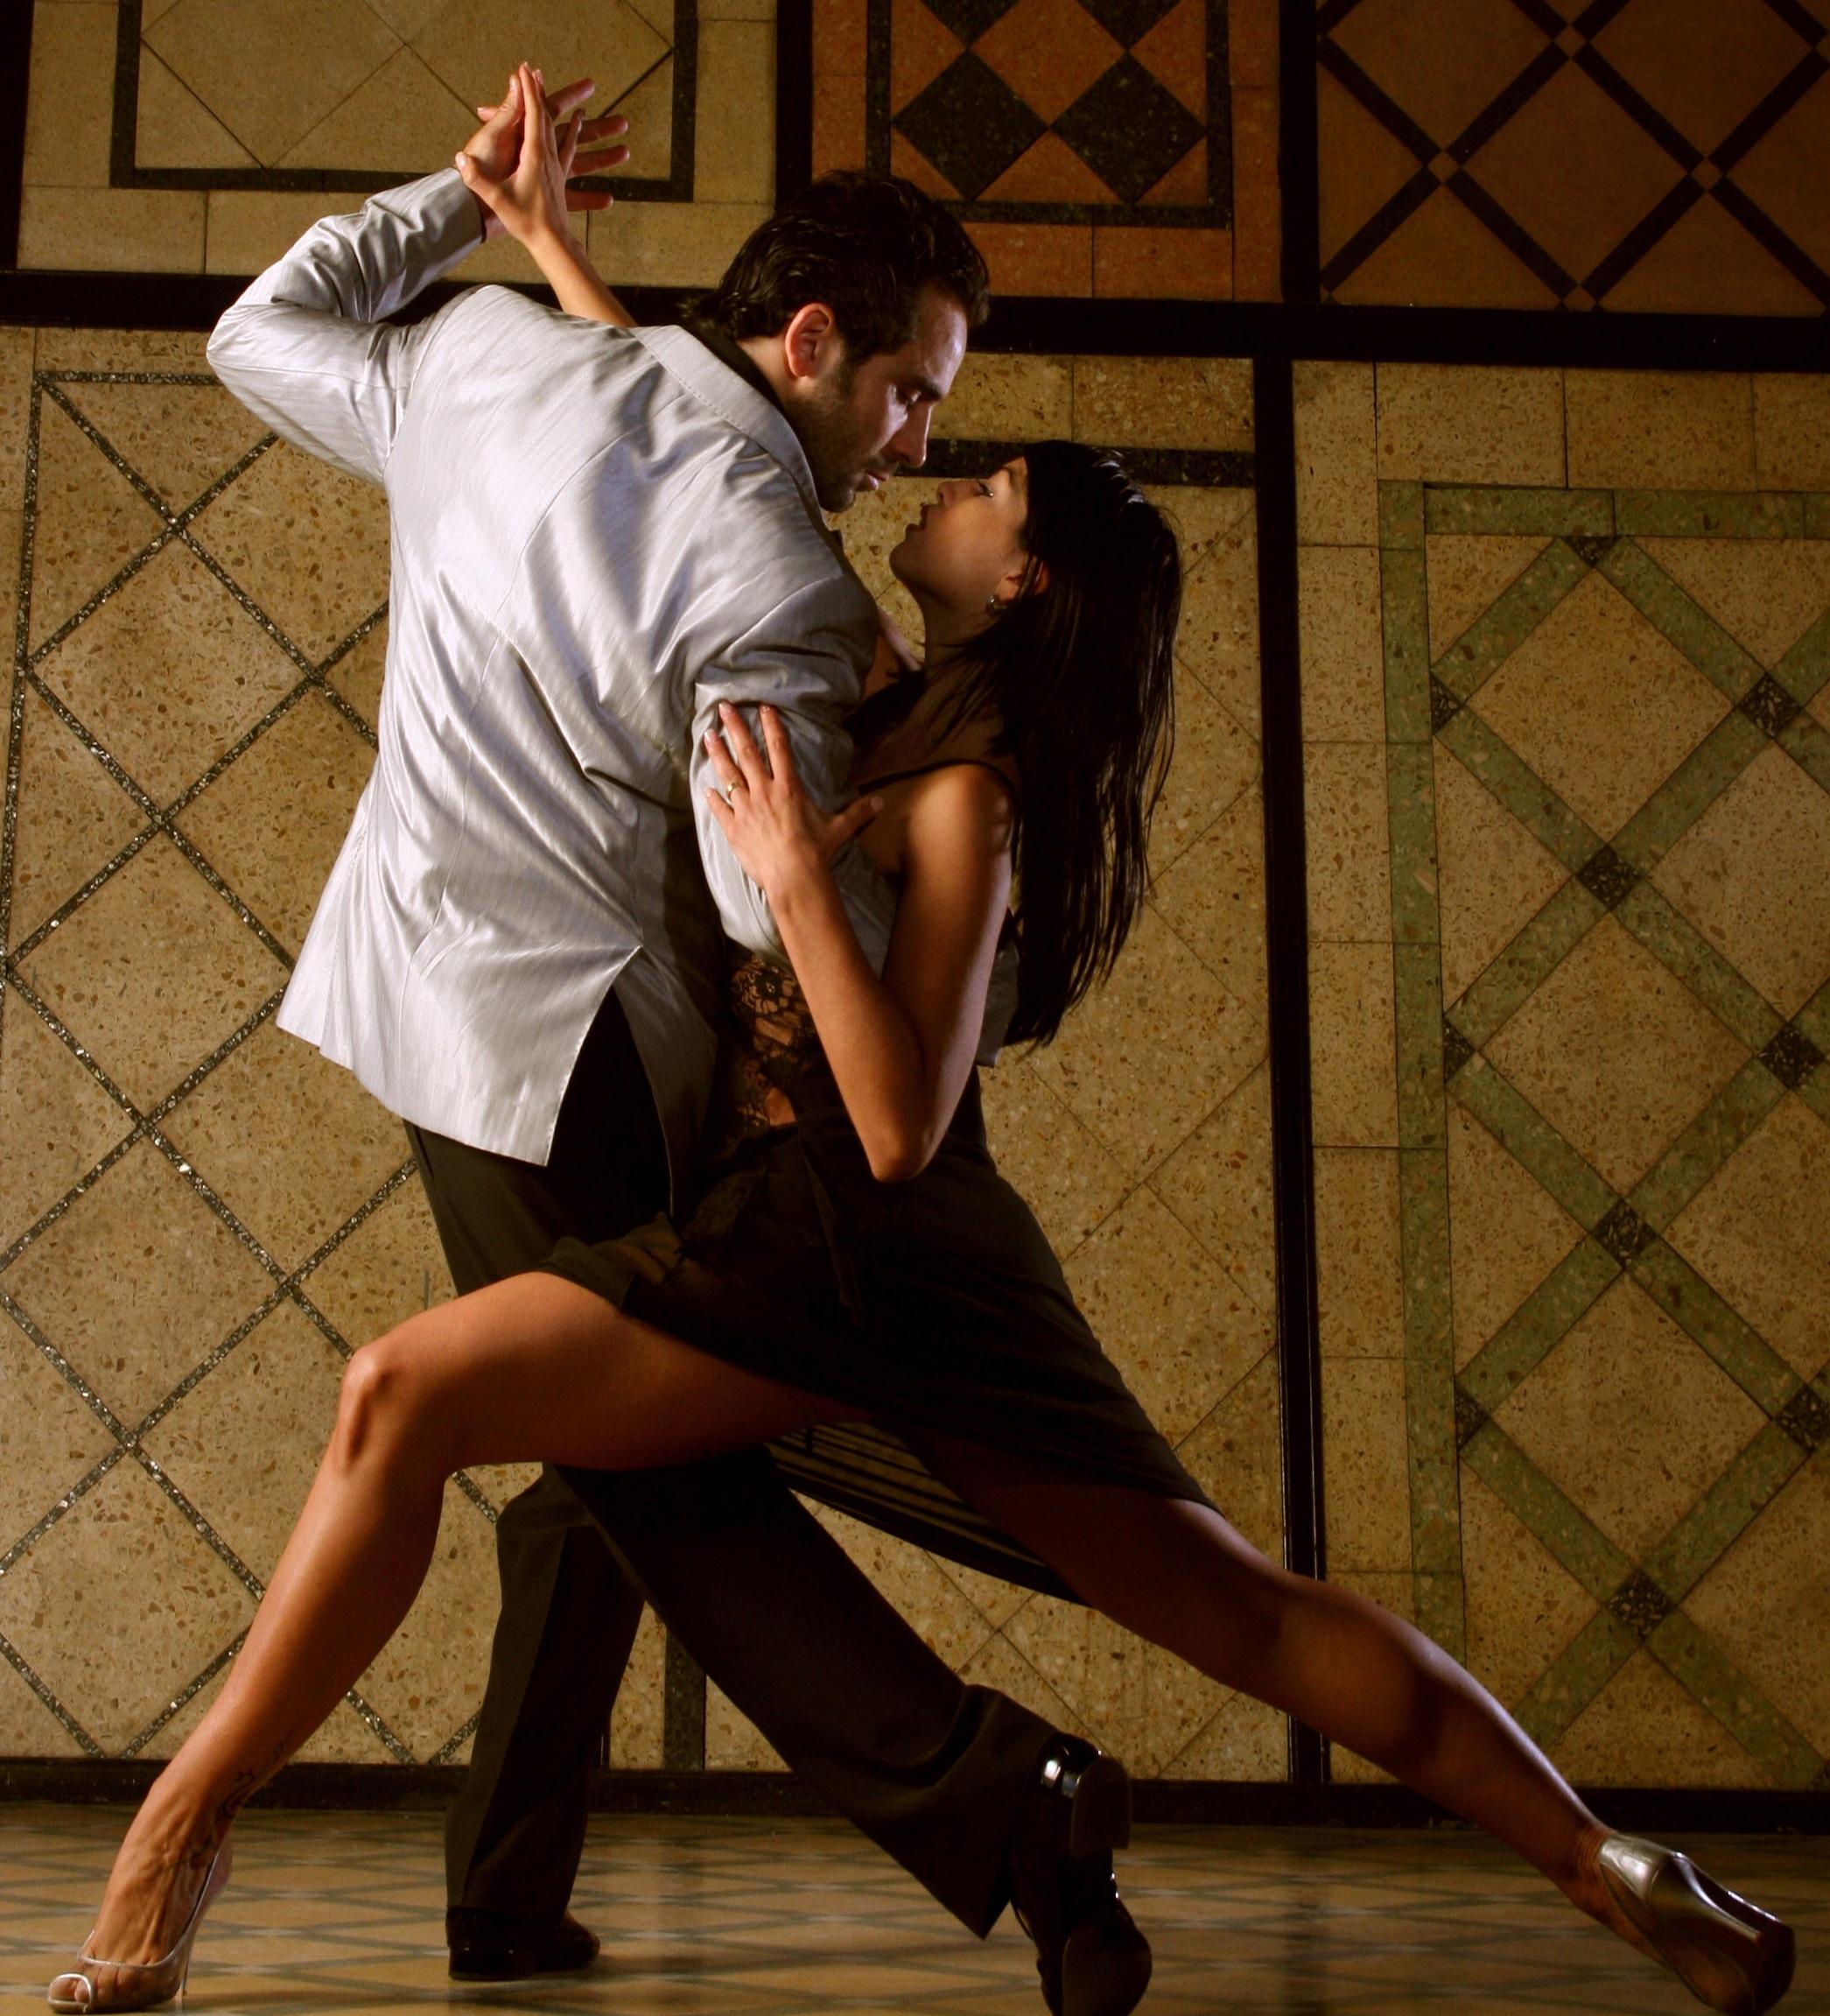 Легкая эротика танец двух тел видео